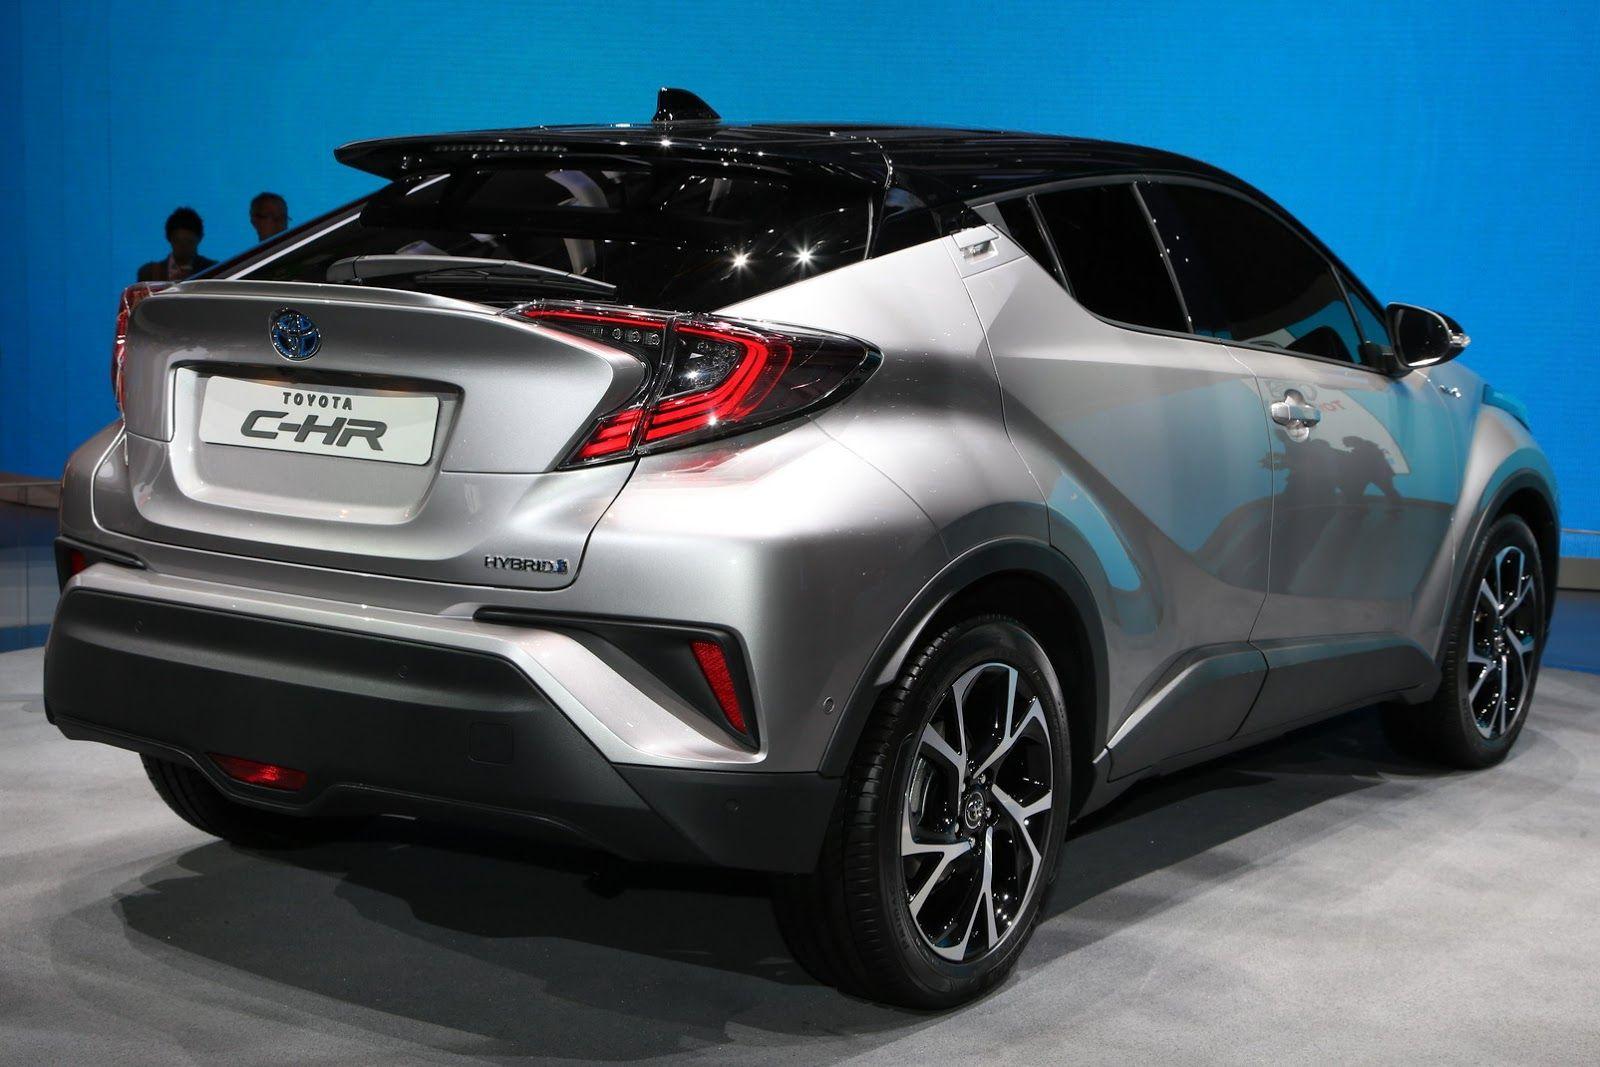 New Toyota C Hr Gets 1 2l Turbo 2 0l And 1 8l Hybrid Powertrains